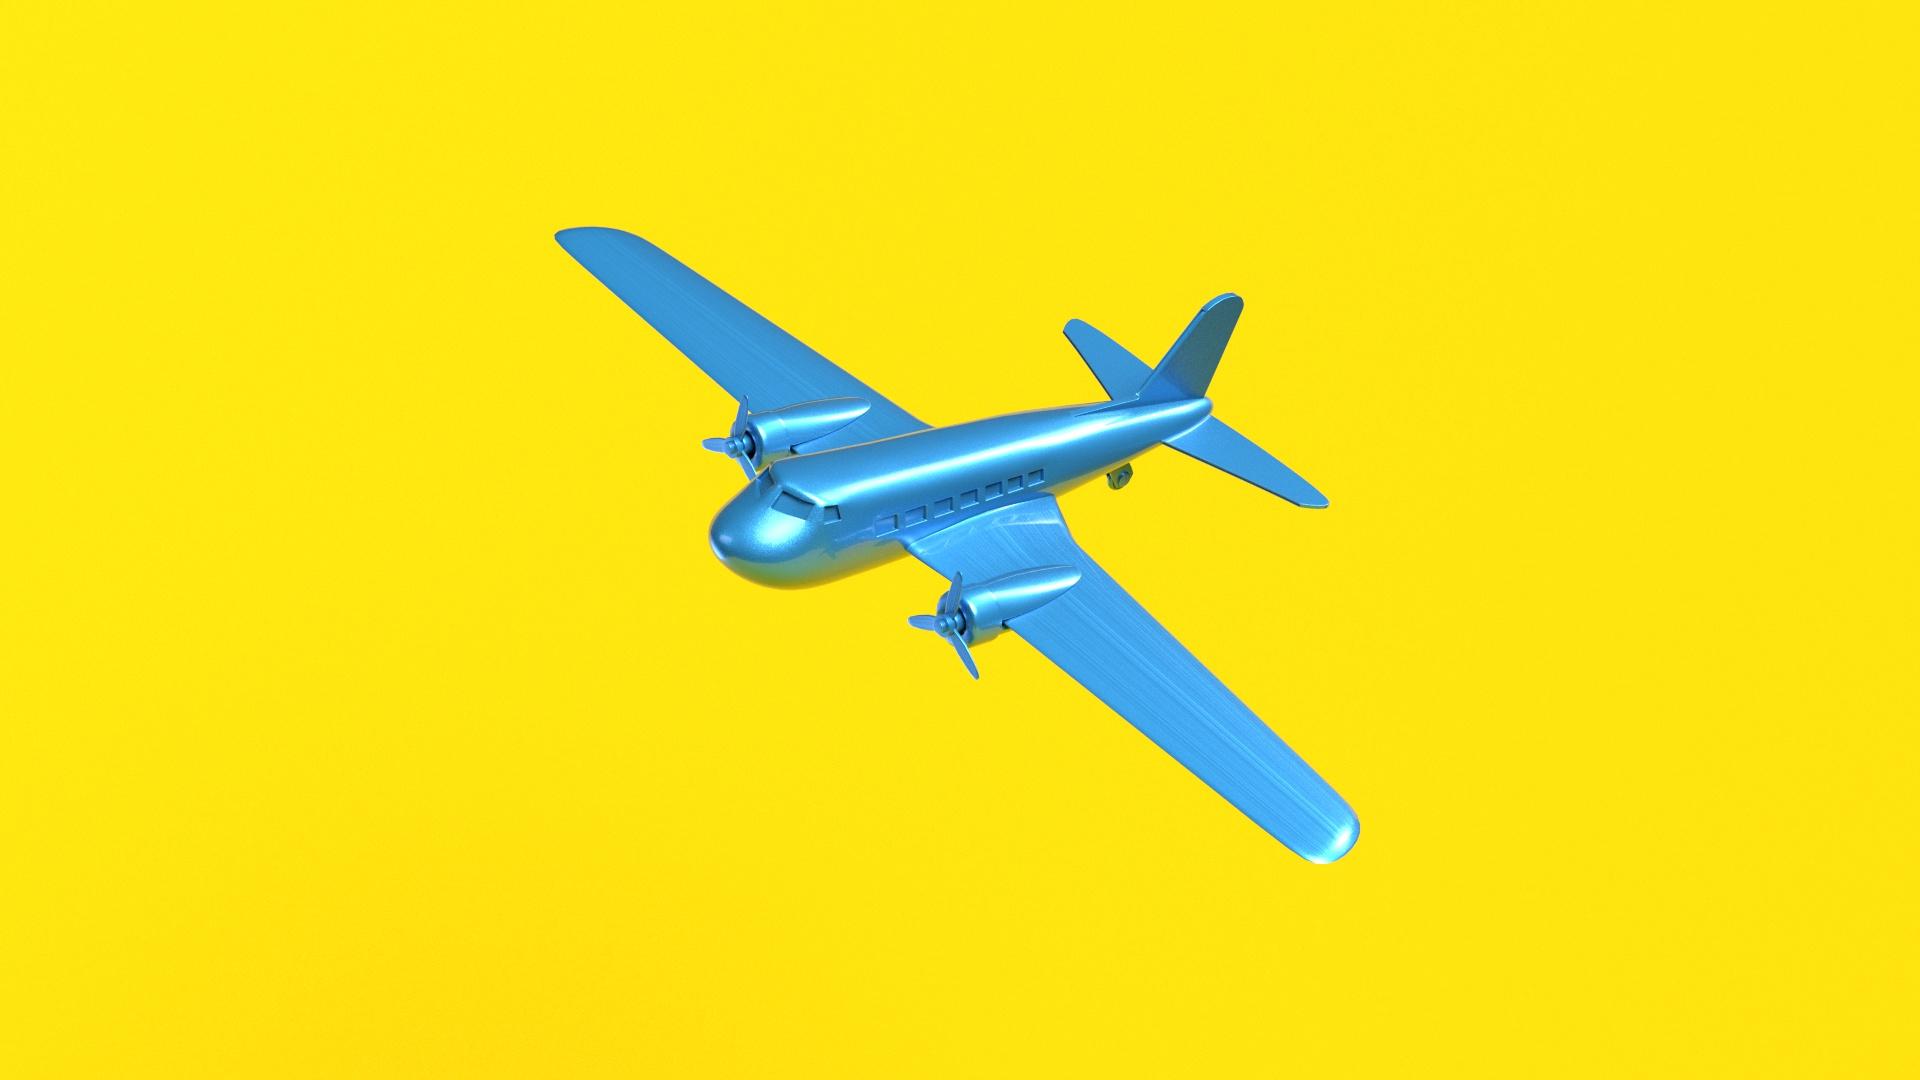 Plane0000.jpg